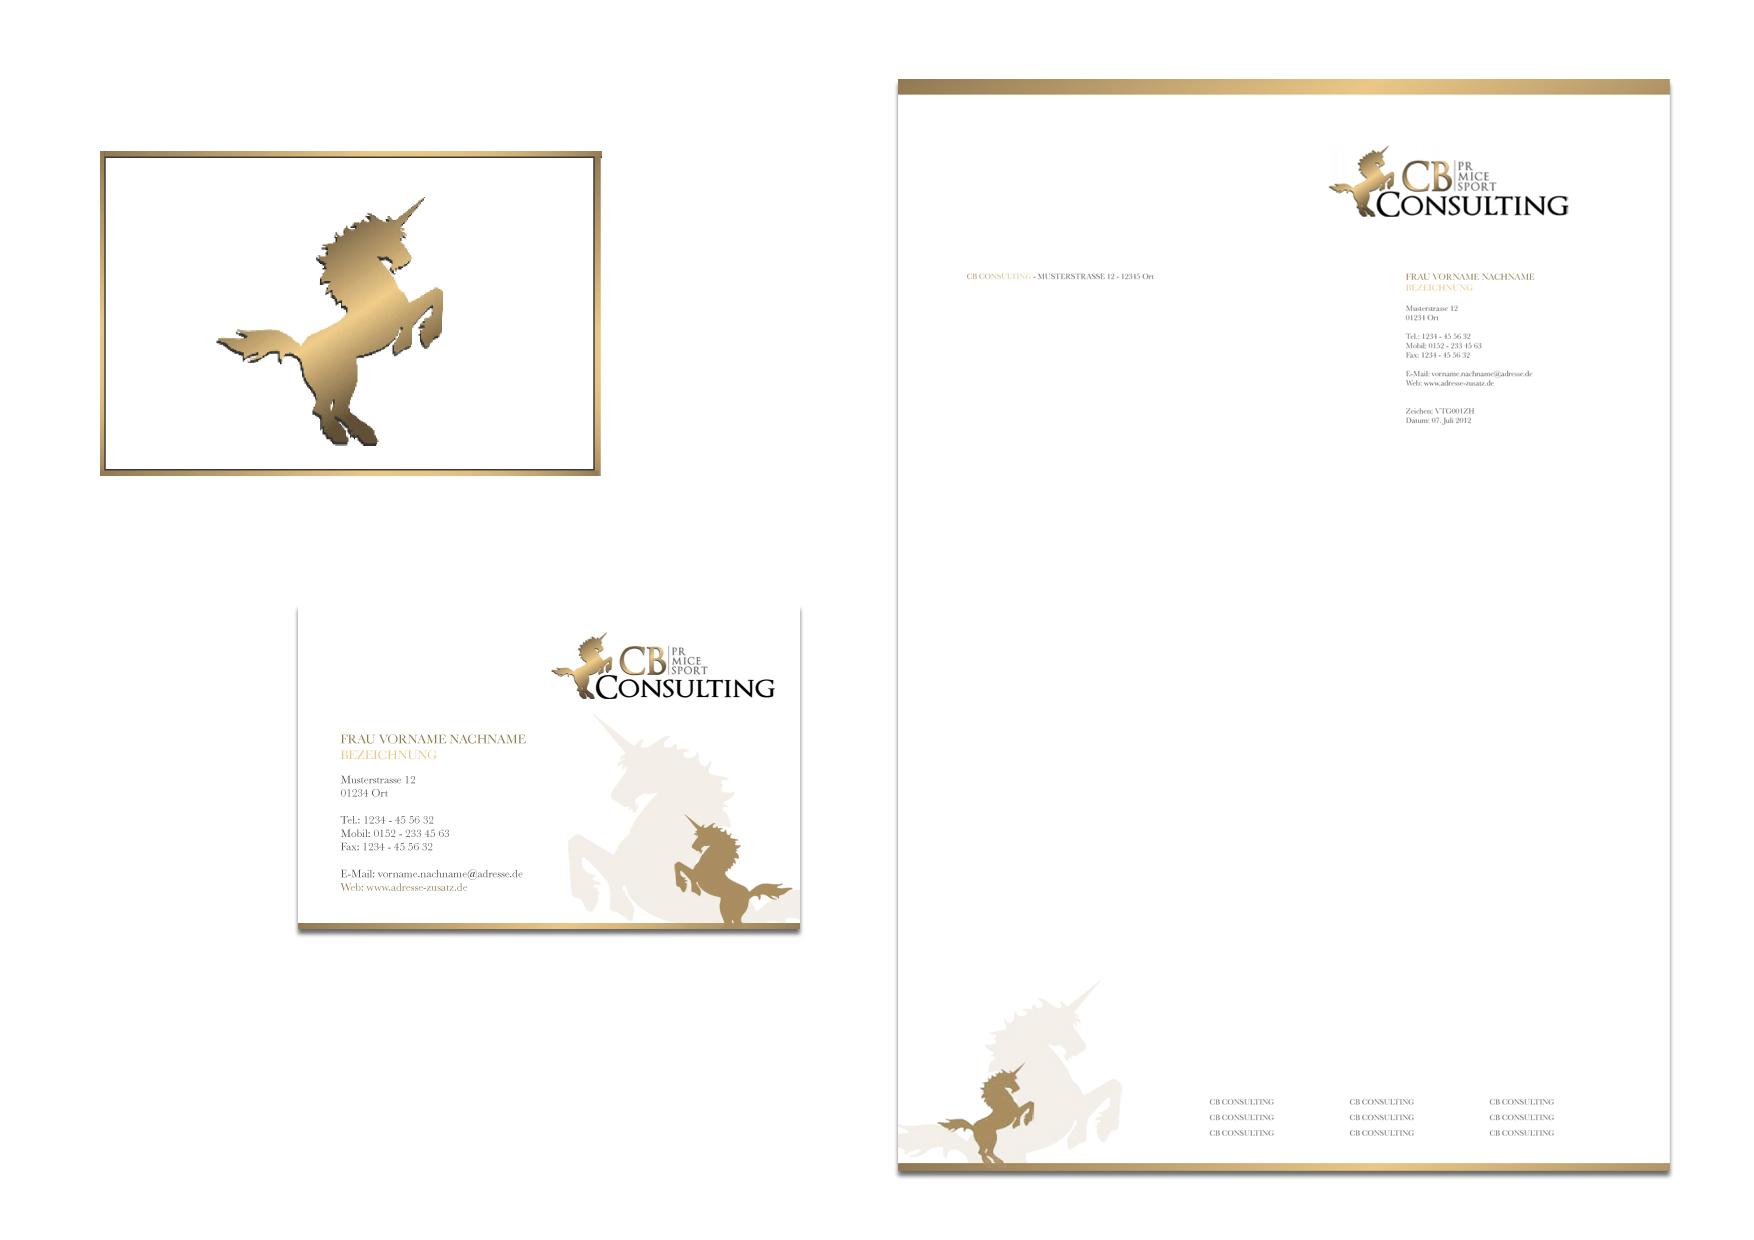 briefpapier business cards power point folie business card